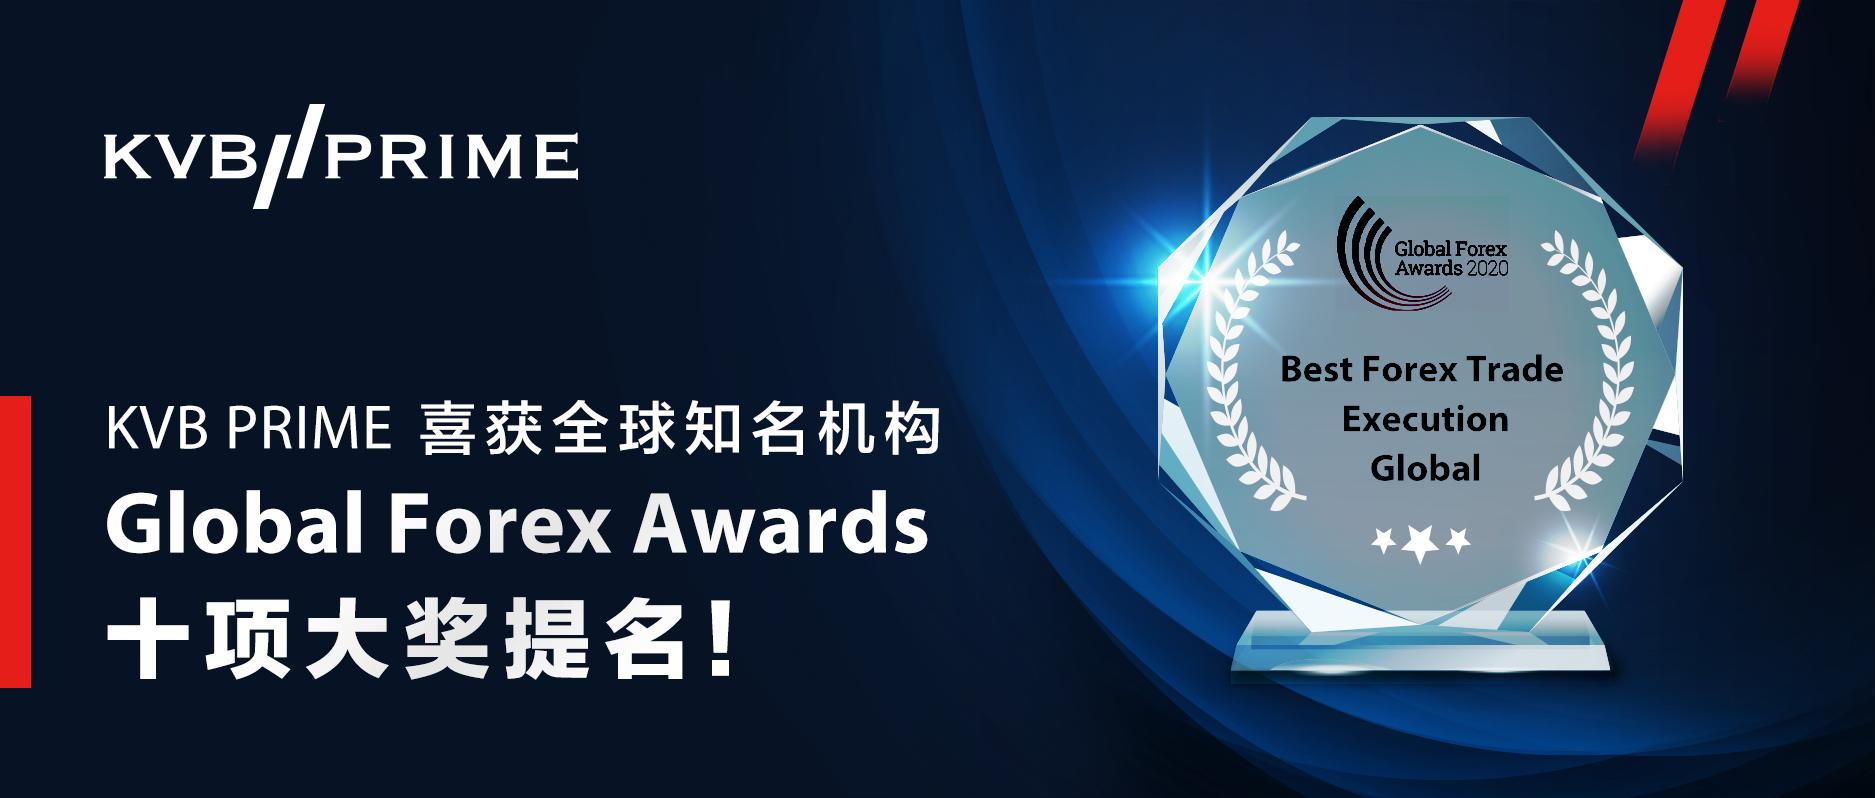 KVB PRIME喜获全球知名机构Global Forex Award 十项大奖提名